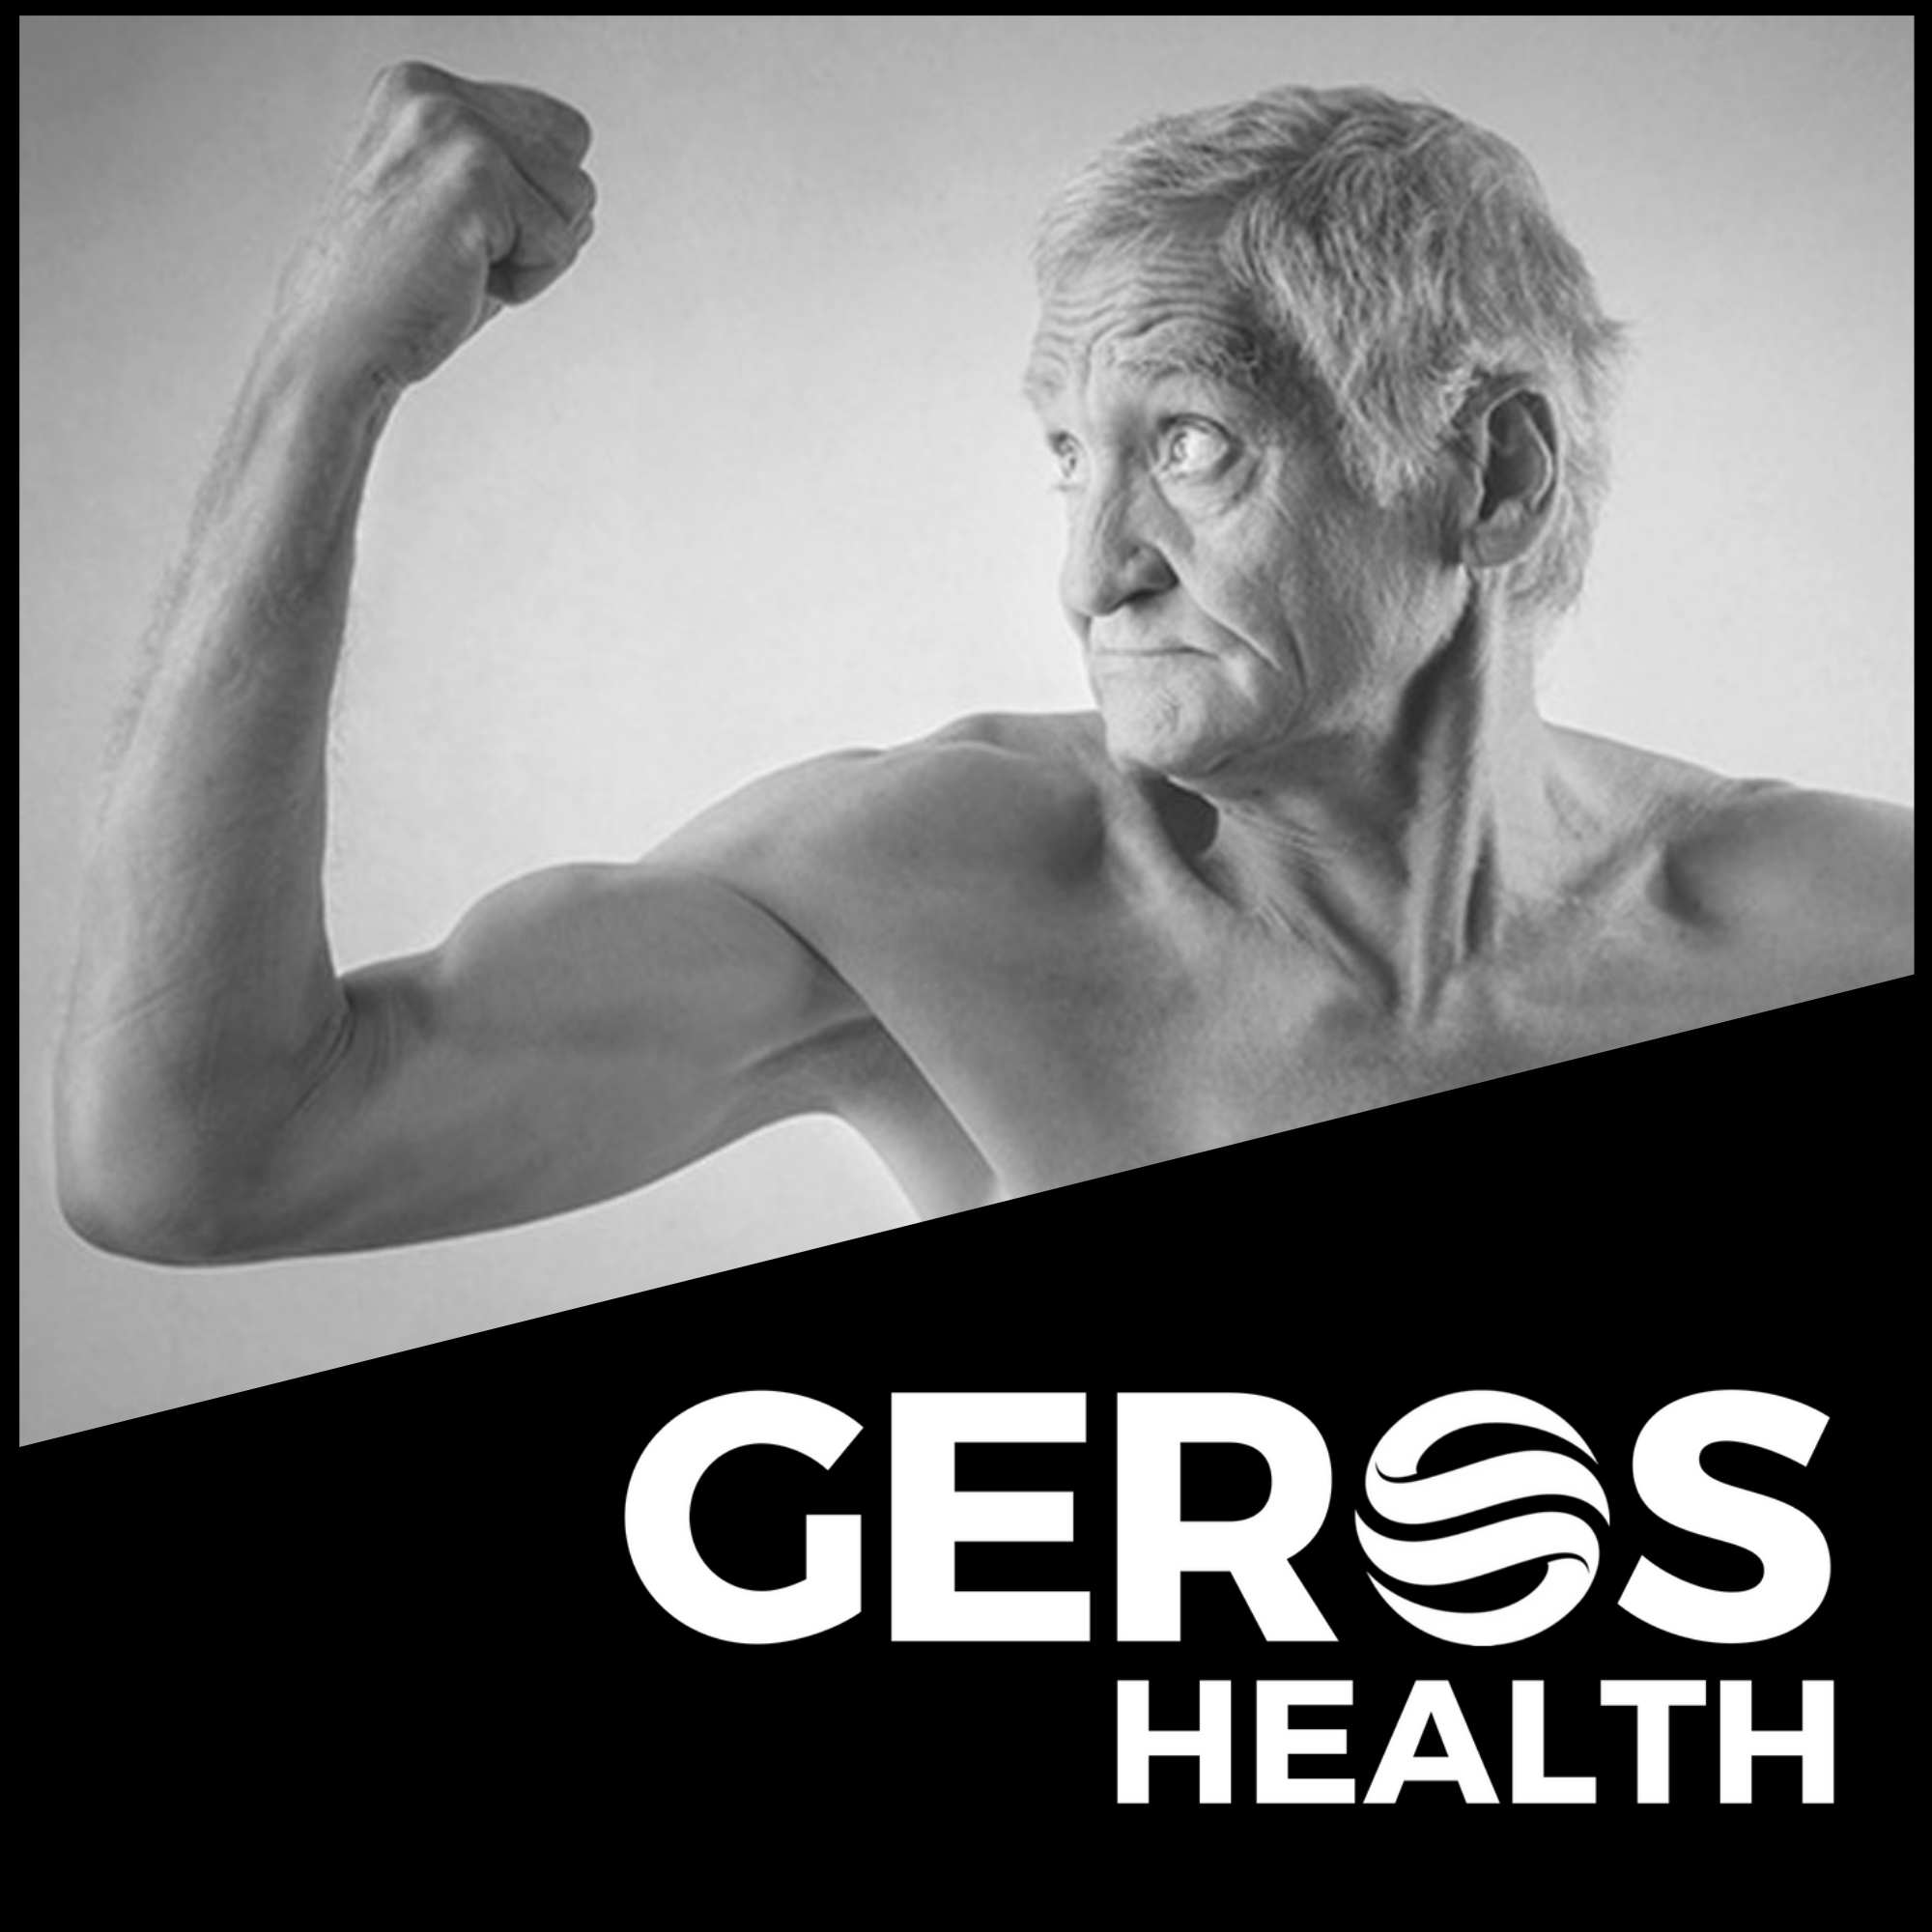 GEROS Health - Physical Therapy | Fitness | Geriatrics show art